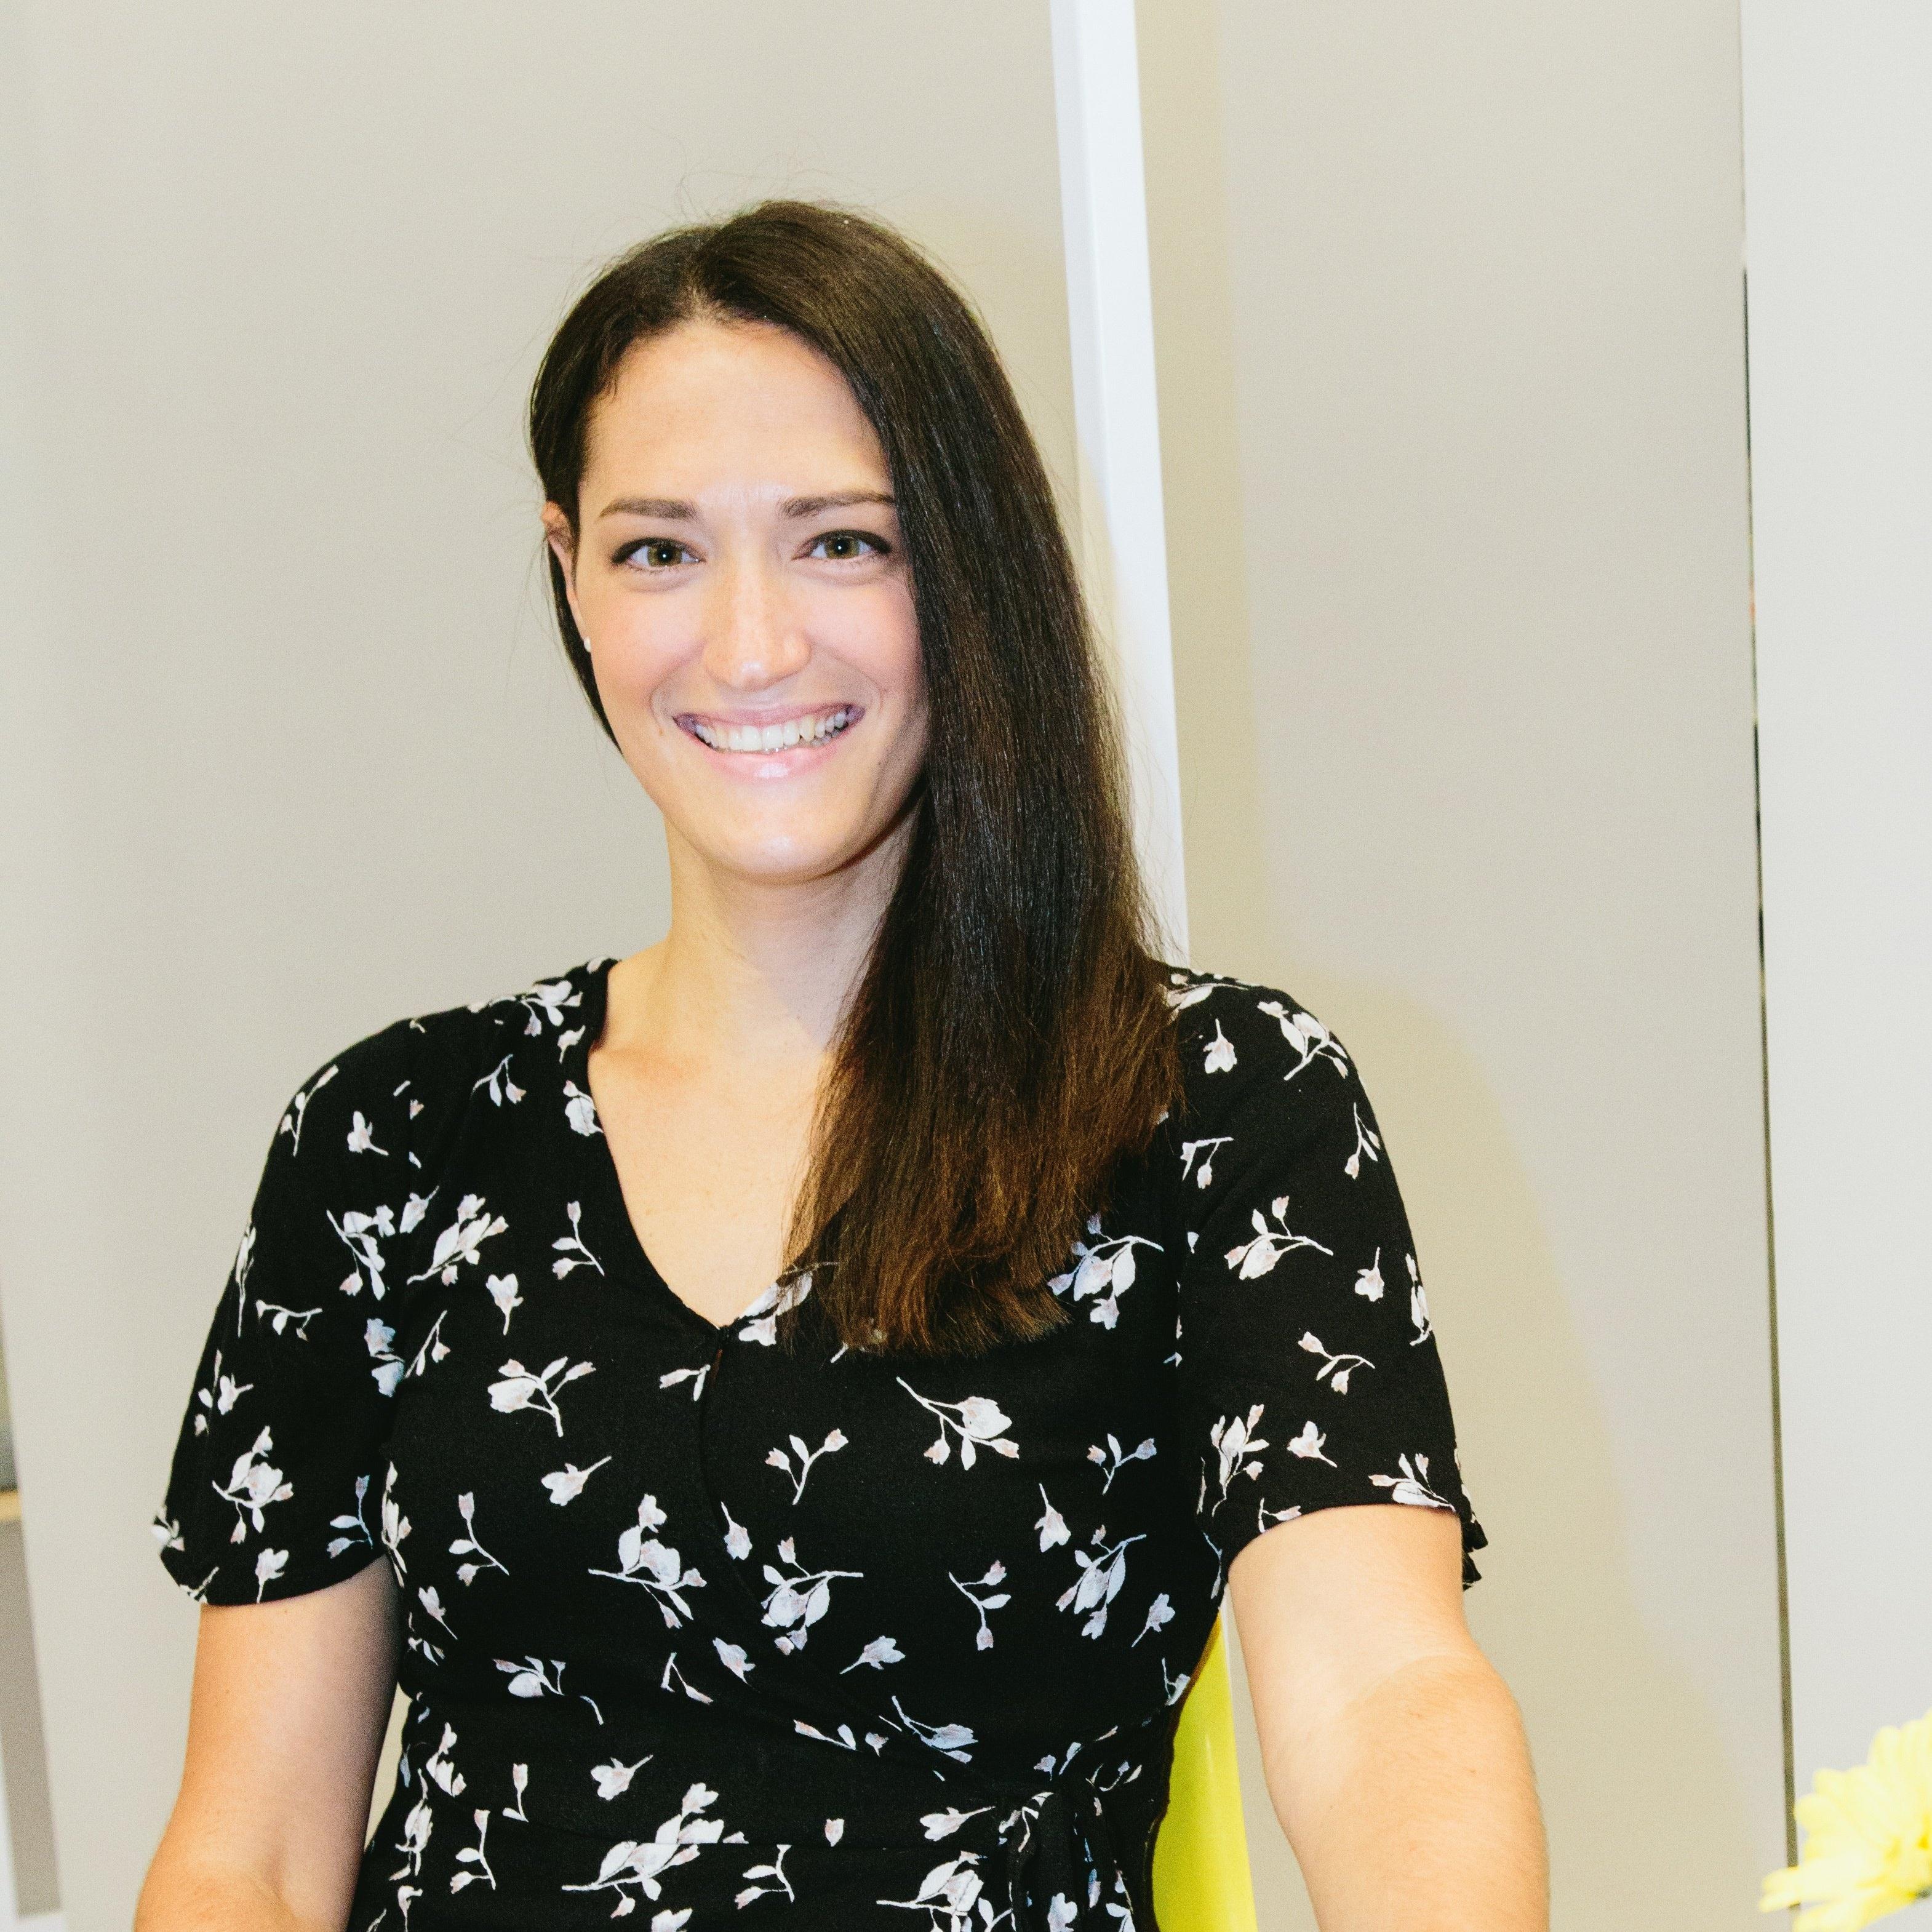 Danielle Thibault marketing rival bell works